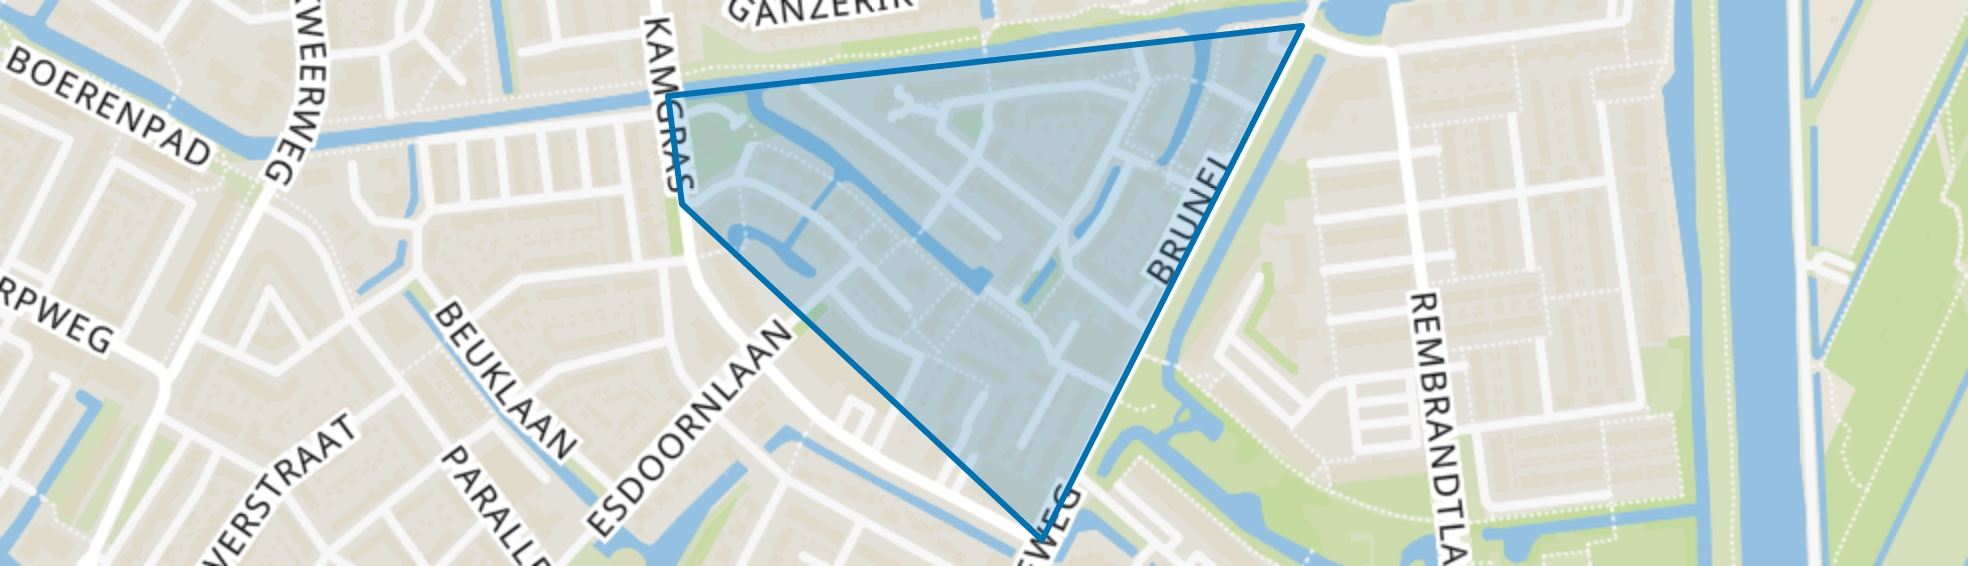 Blokweer Zuid, Alblasserdam map